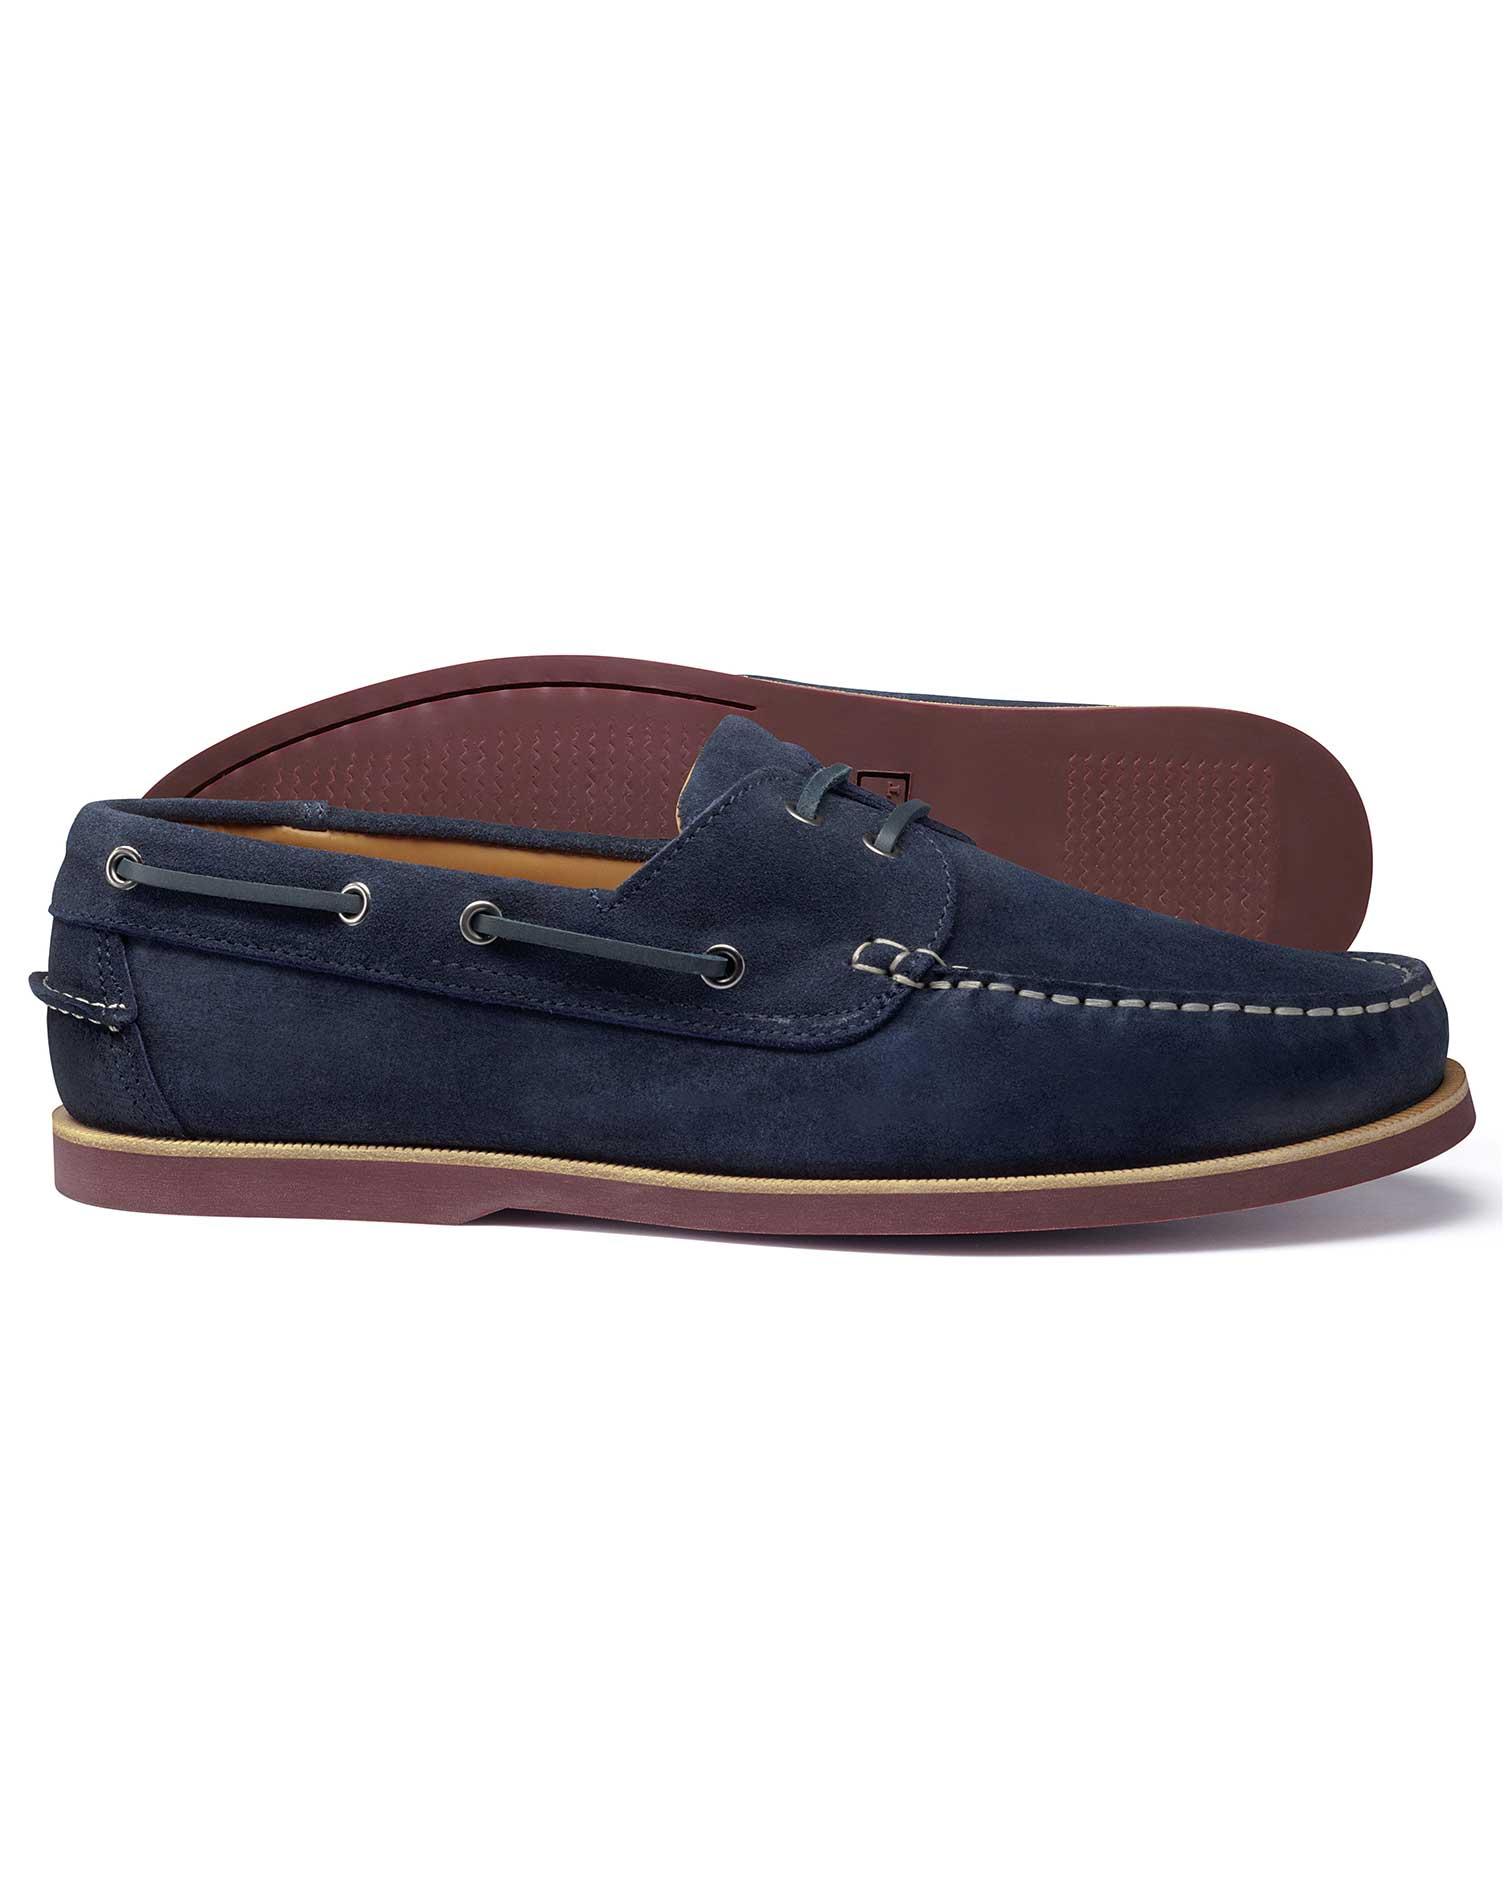 Blue Boat Shoe Size 6 R by Charles Tyrwhitt